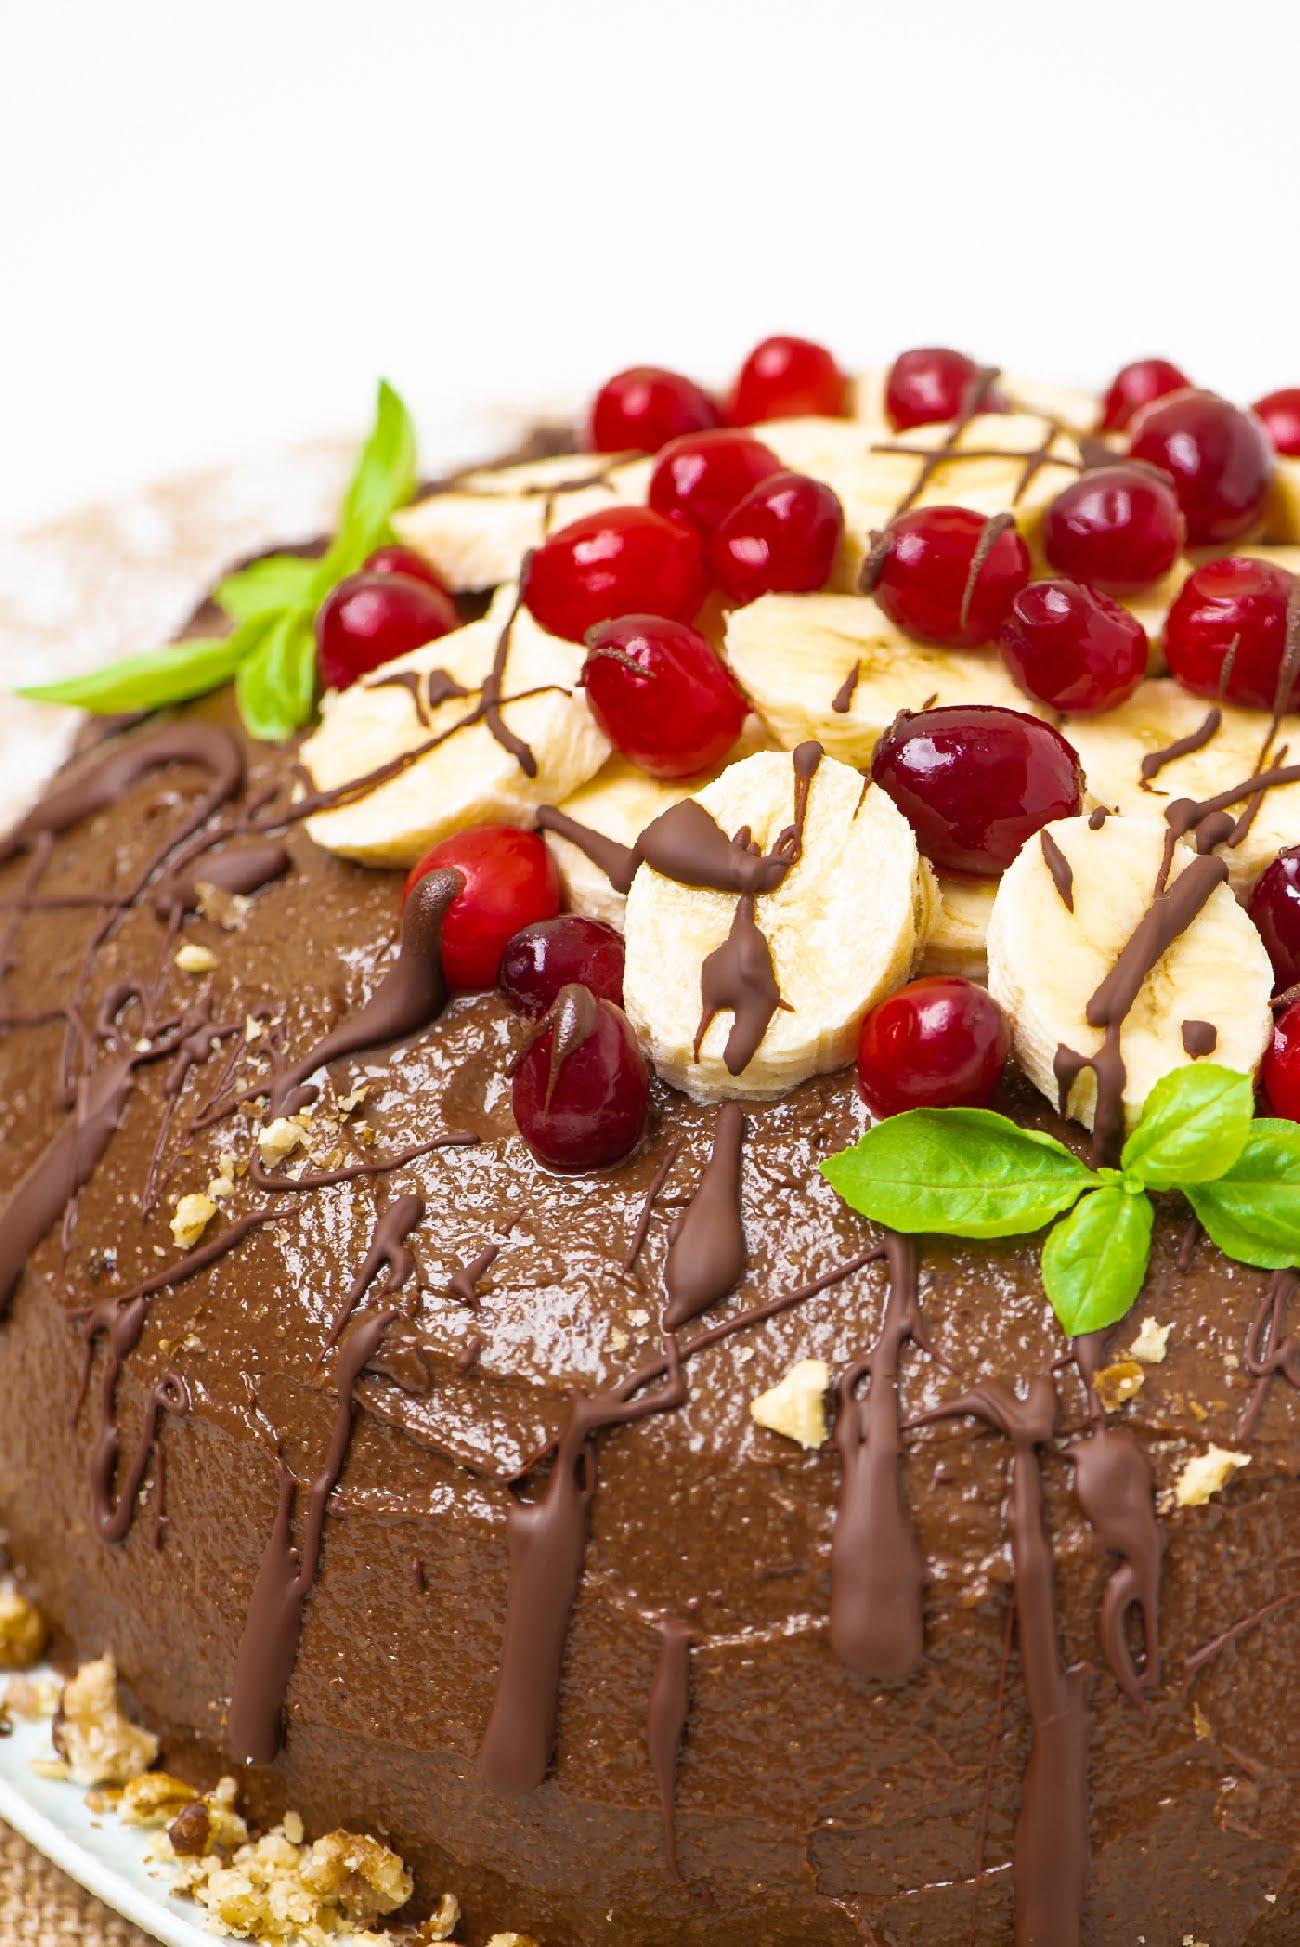 Macro of the cake